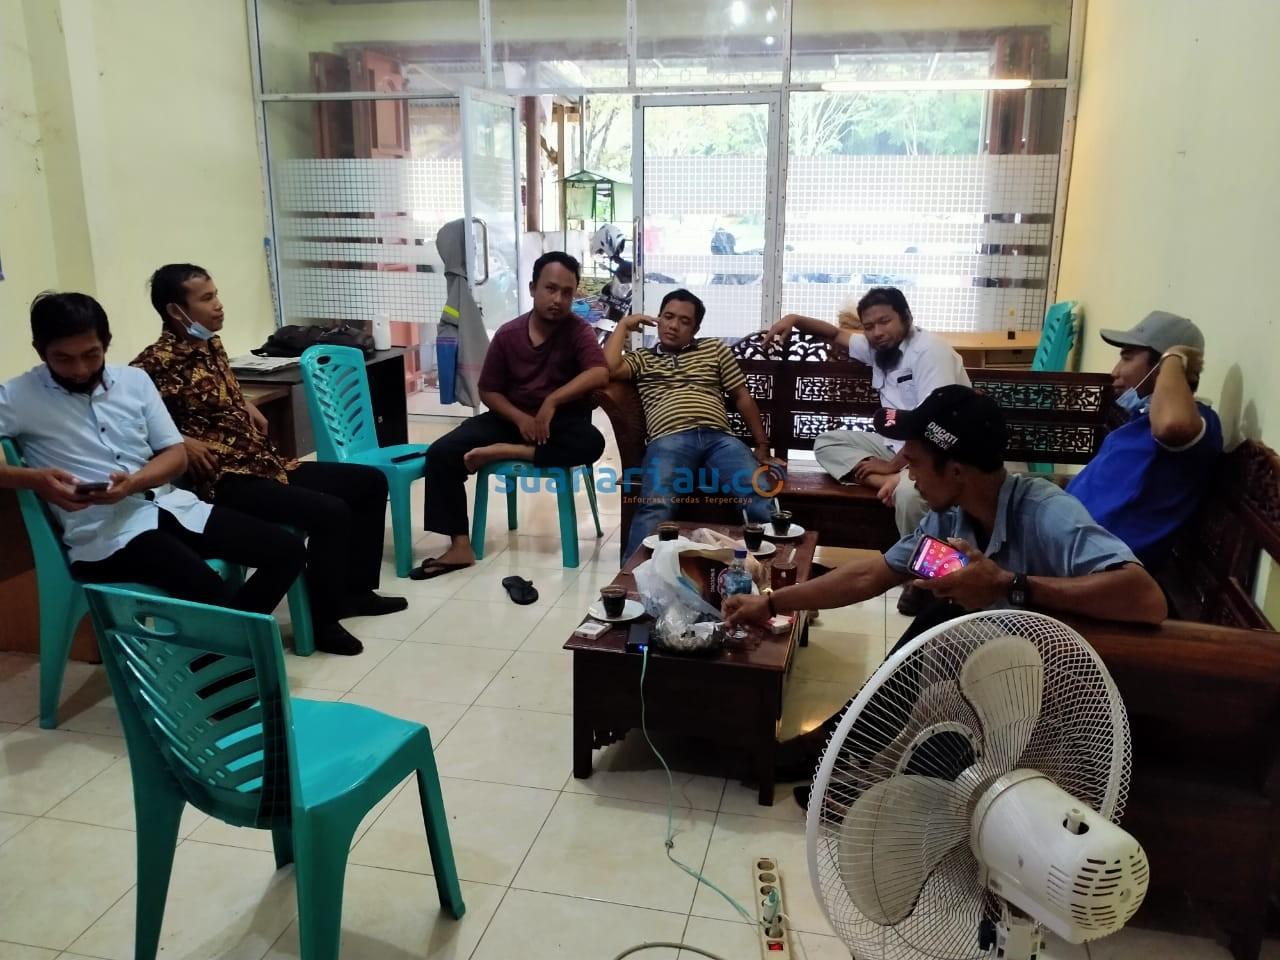 Peserta Seleksi Juru Tulis II Kampung Empang Baru didampingi Bapekam jumpa Pers di Kantor PWI Siak